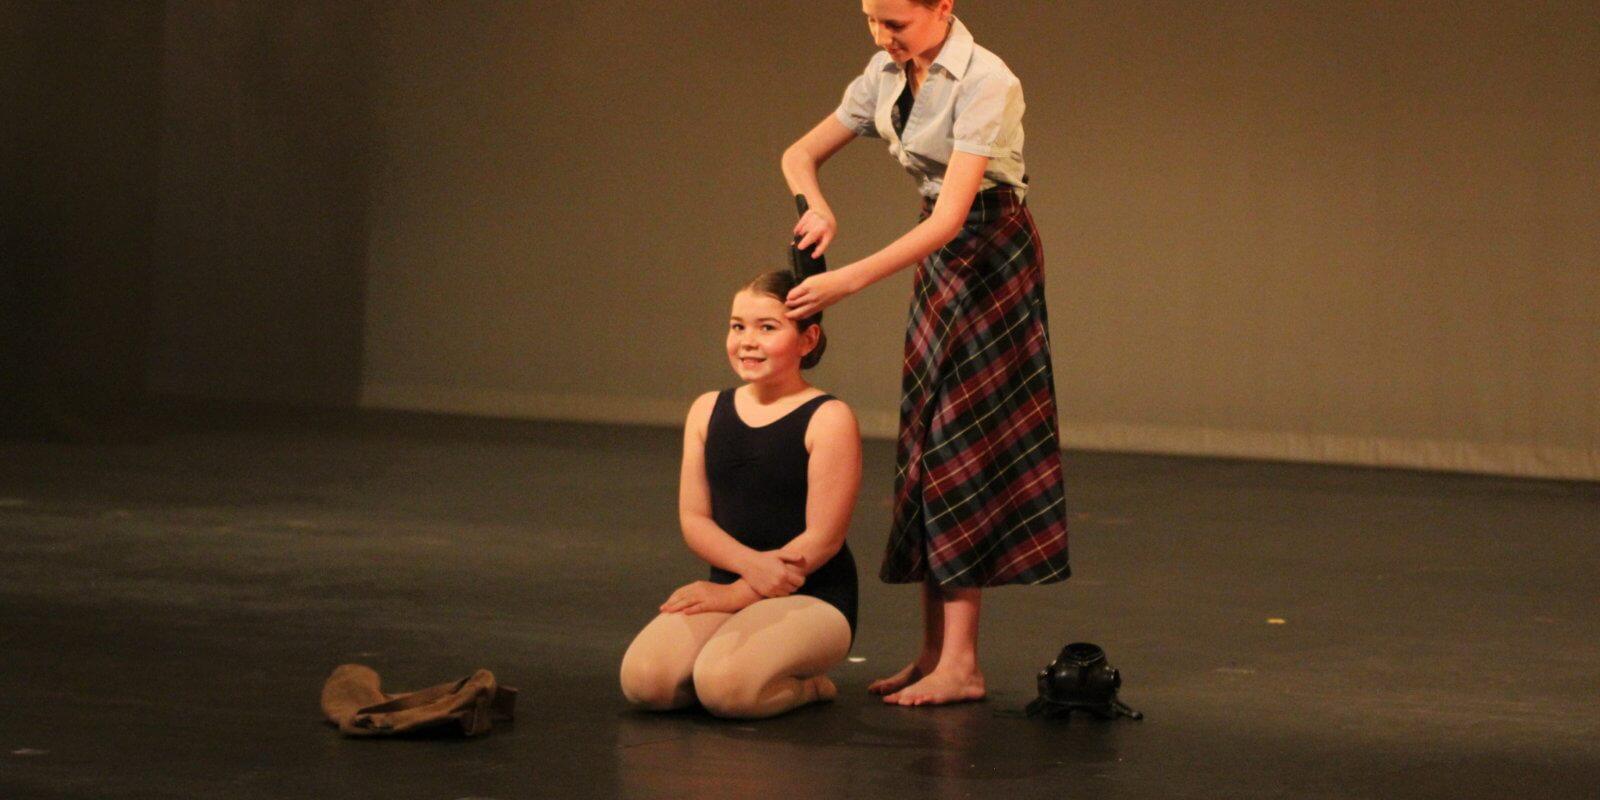 Arts1 Gallery: Dare to Dance 'RAD Centenary Celebration' 16